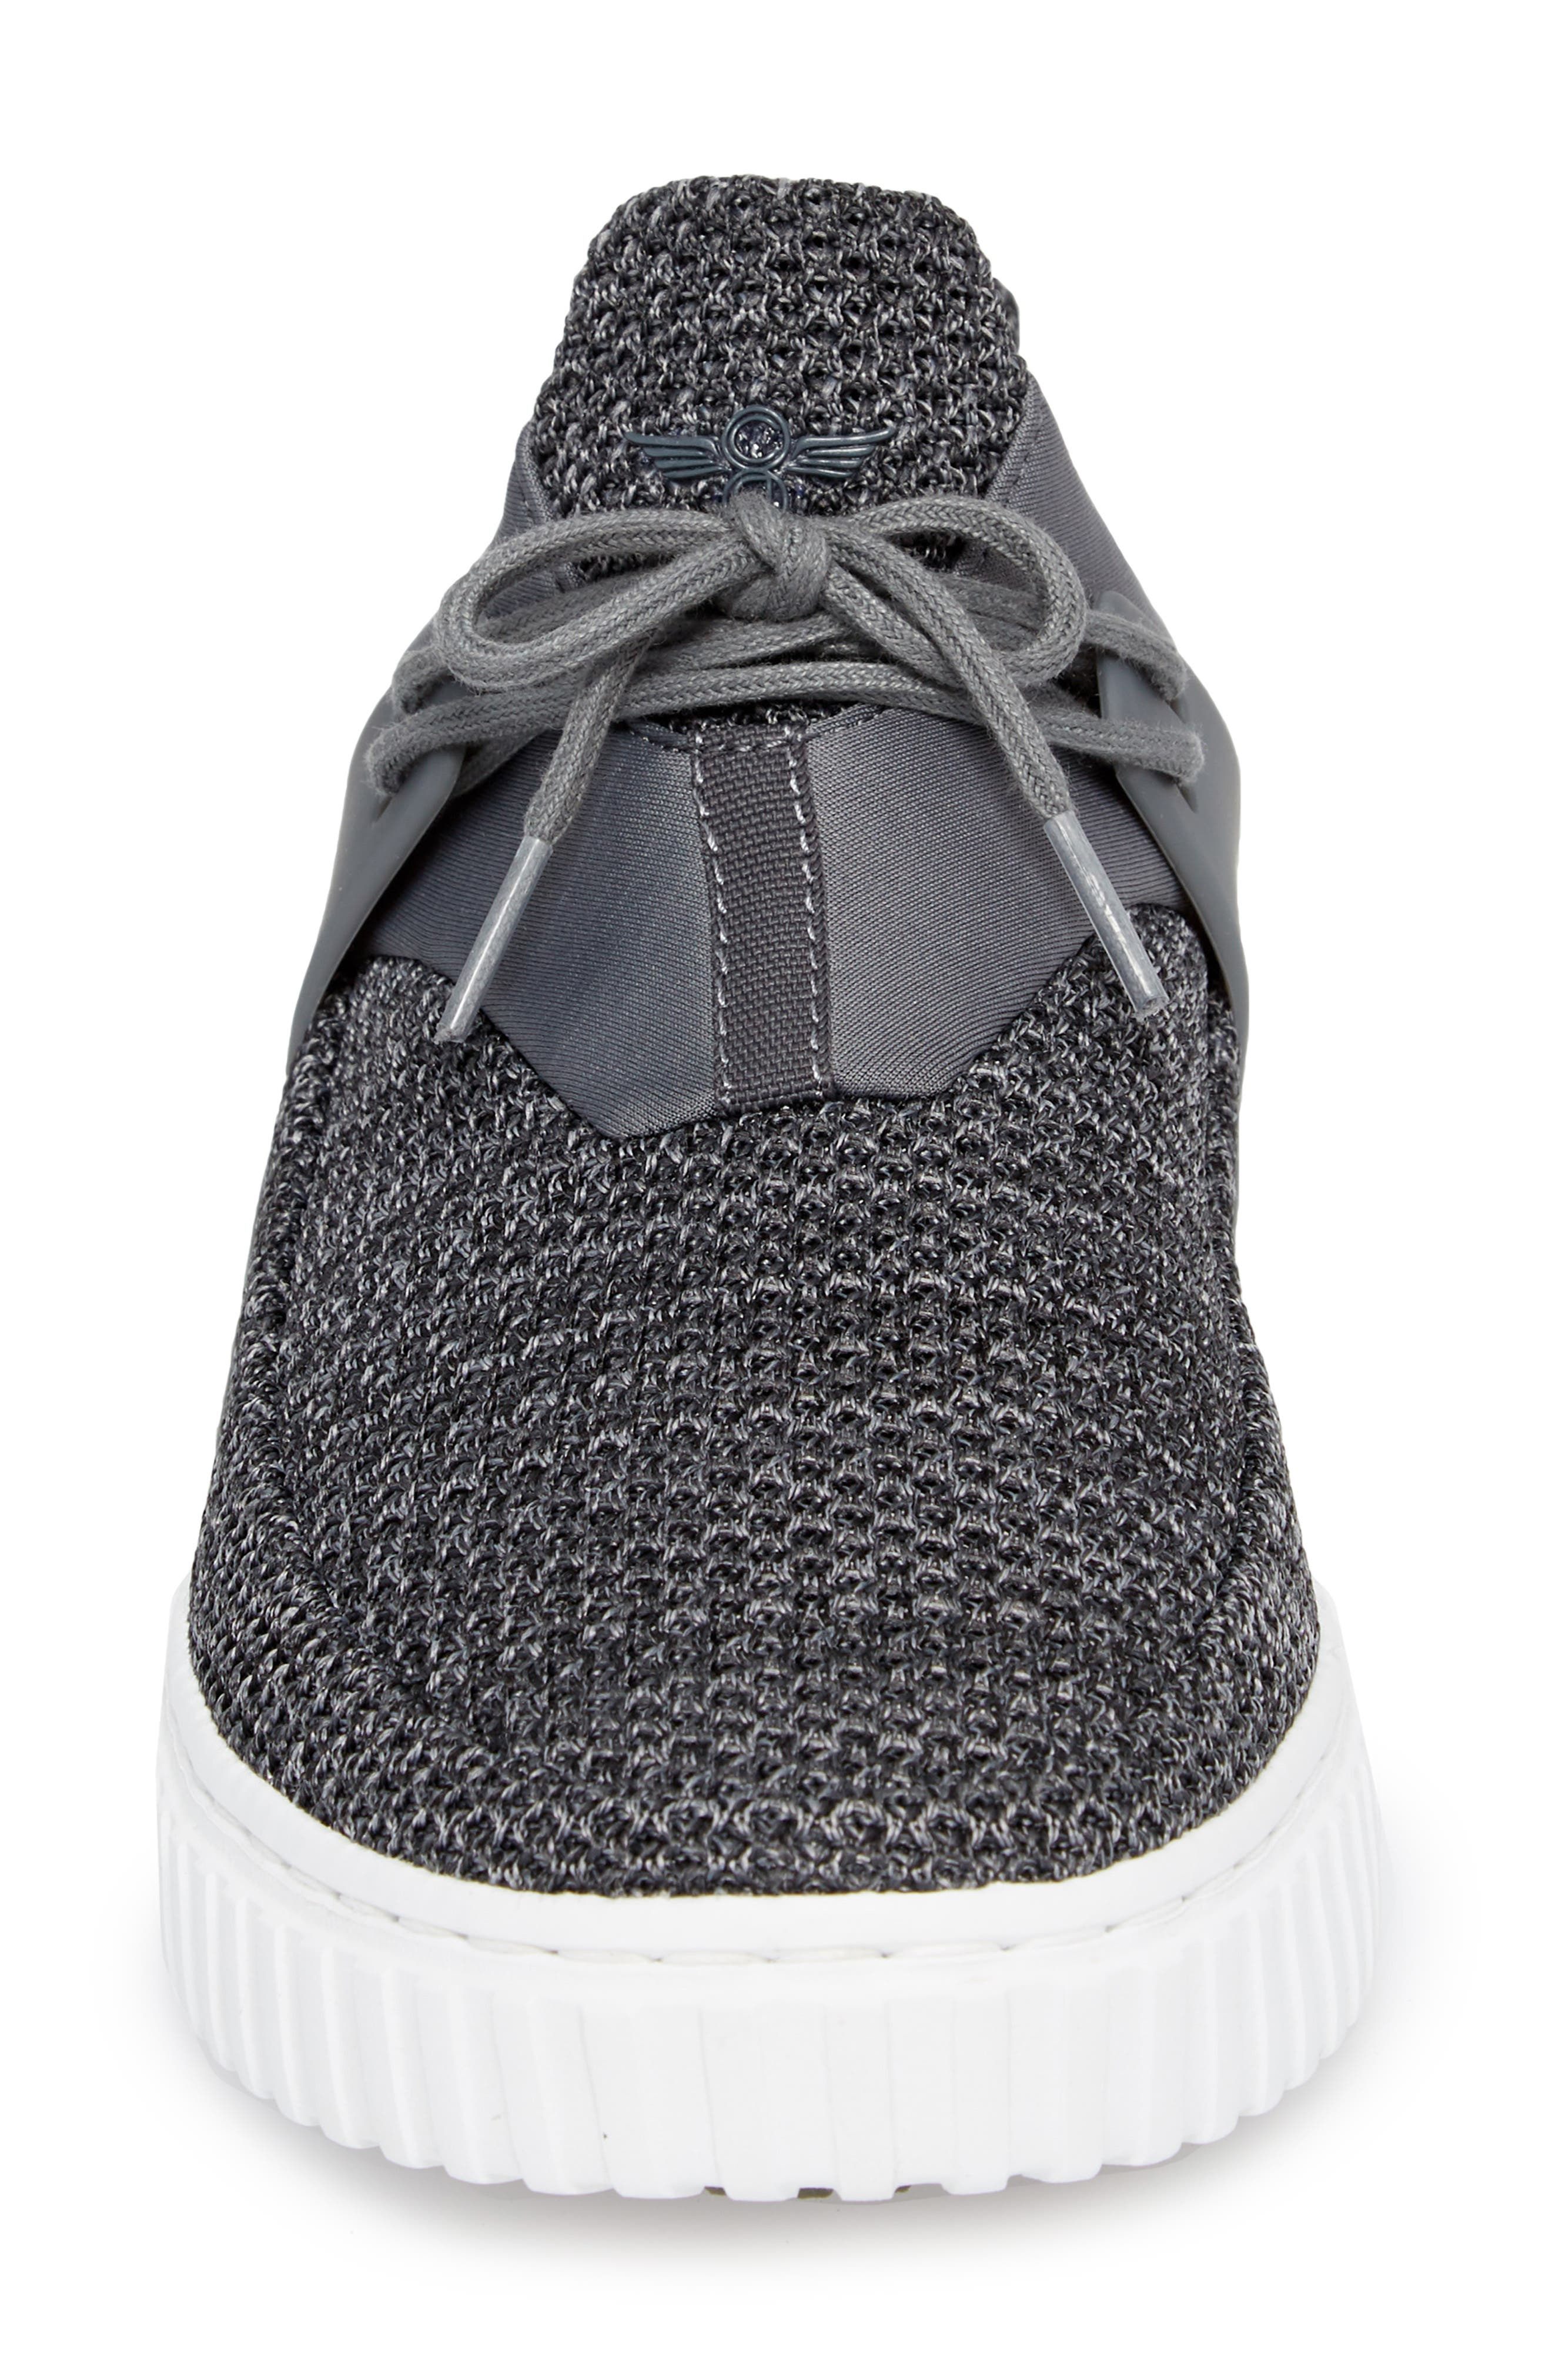 Castucci Knit Sneaker,                             Alternate thumbnail 4, color,                             021